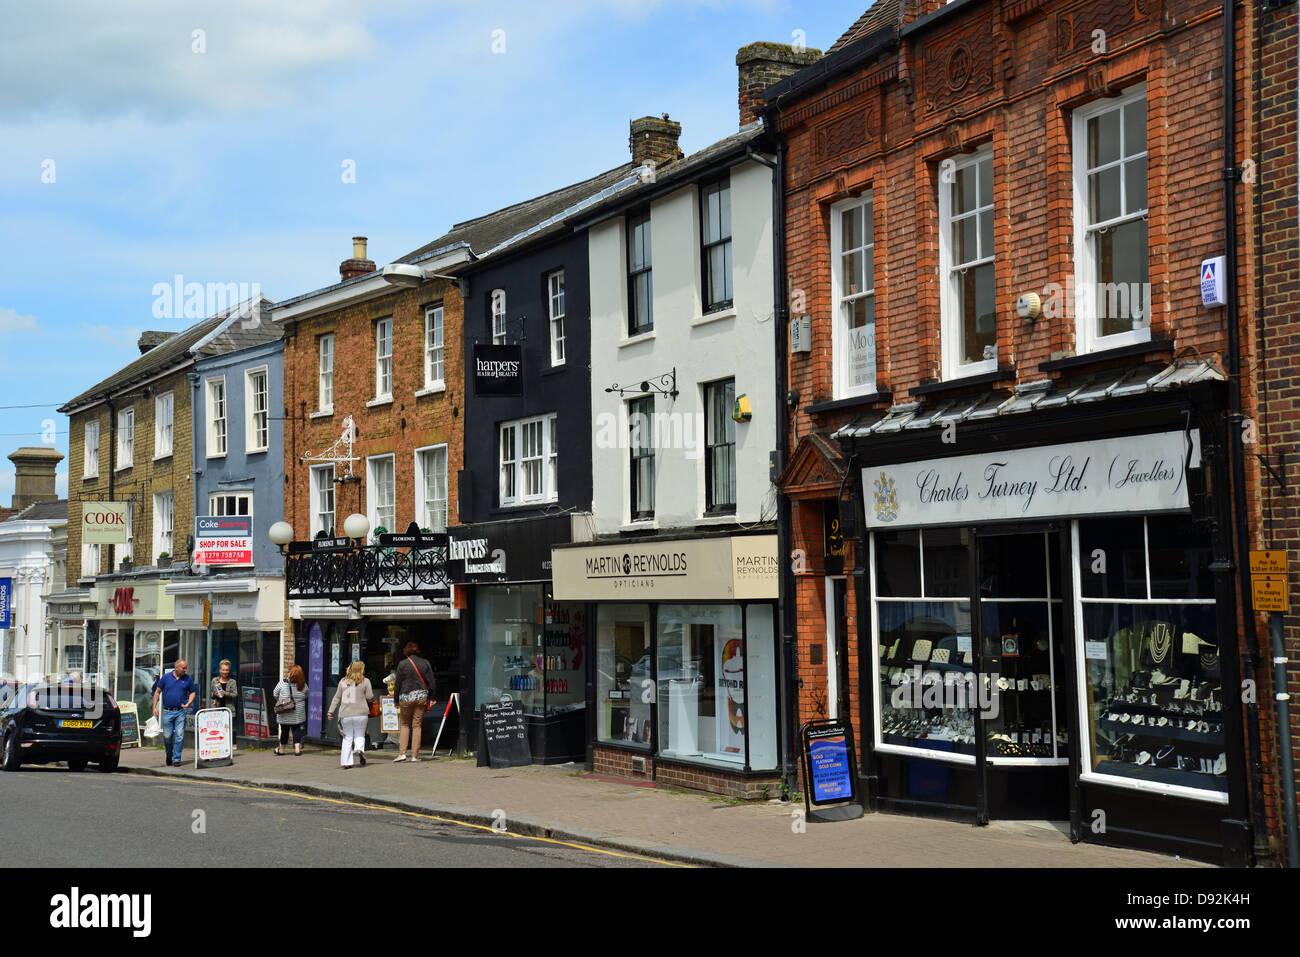 North Street, Bishop's Stortford, Hertfordshire, England, United Kingdom Stock Photo